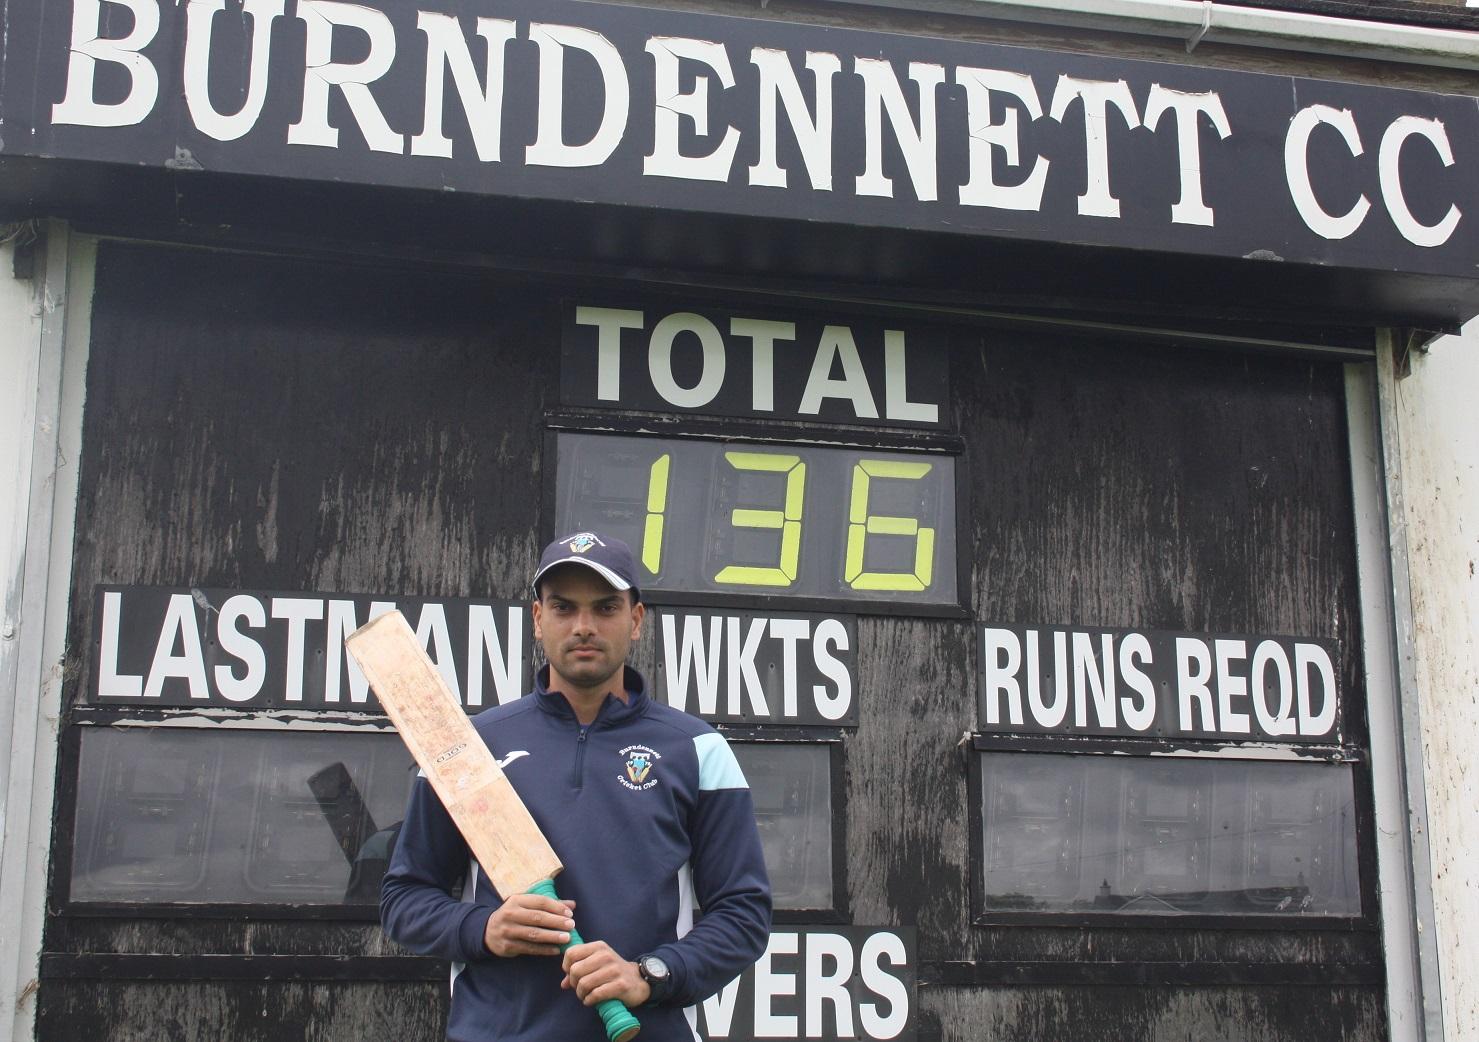 Burndennett overseas player Salman Ahmed scored an unbeaten 136 against St Johnston in Saturday's T20